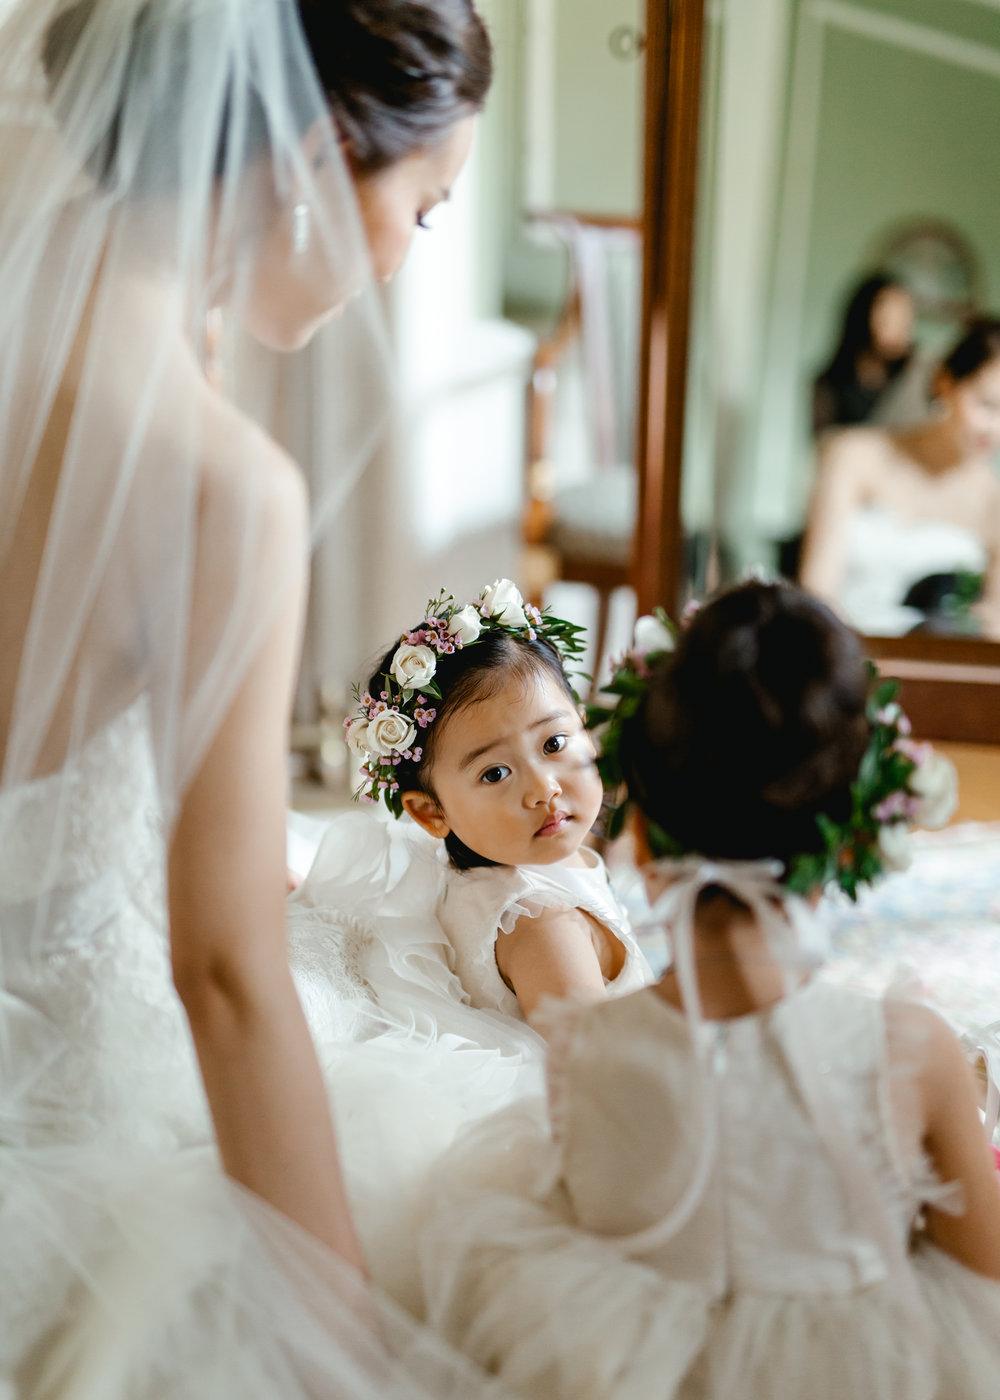 herafilms_wedding_sara_lei_hera_selects-26.jpg